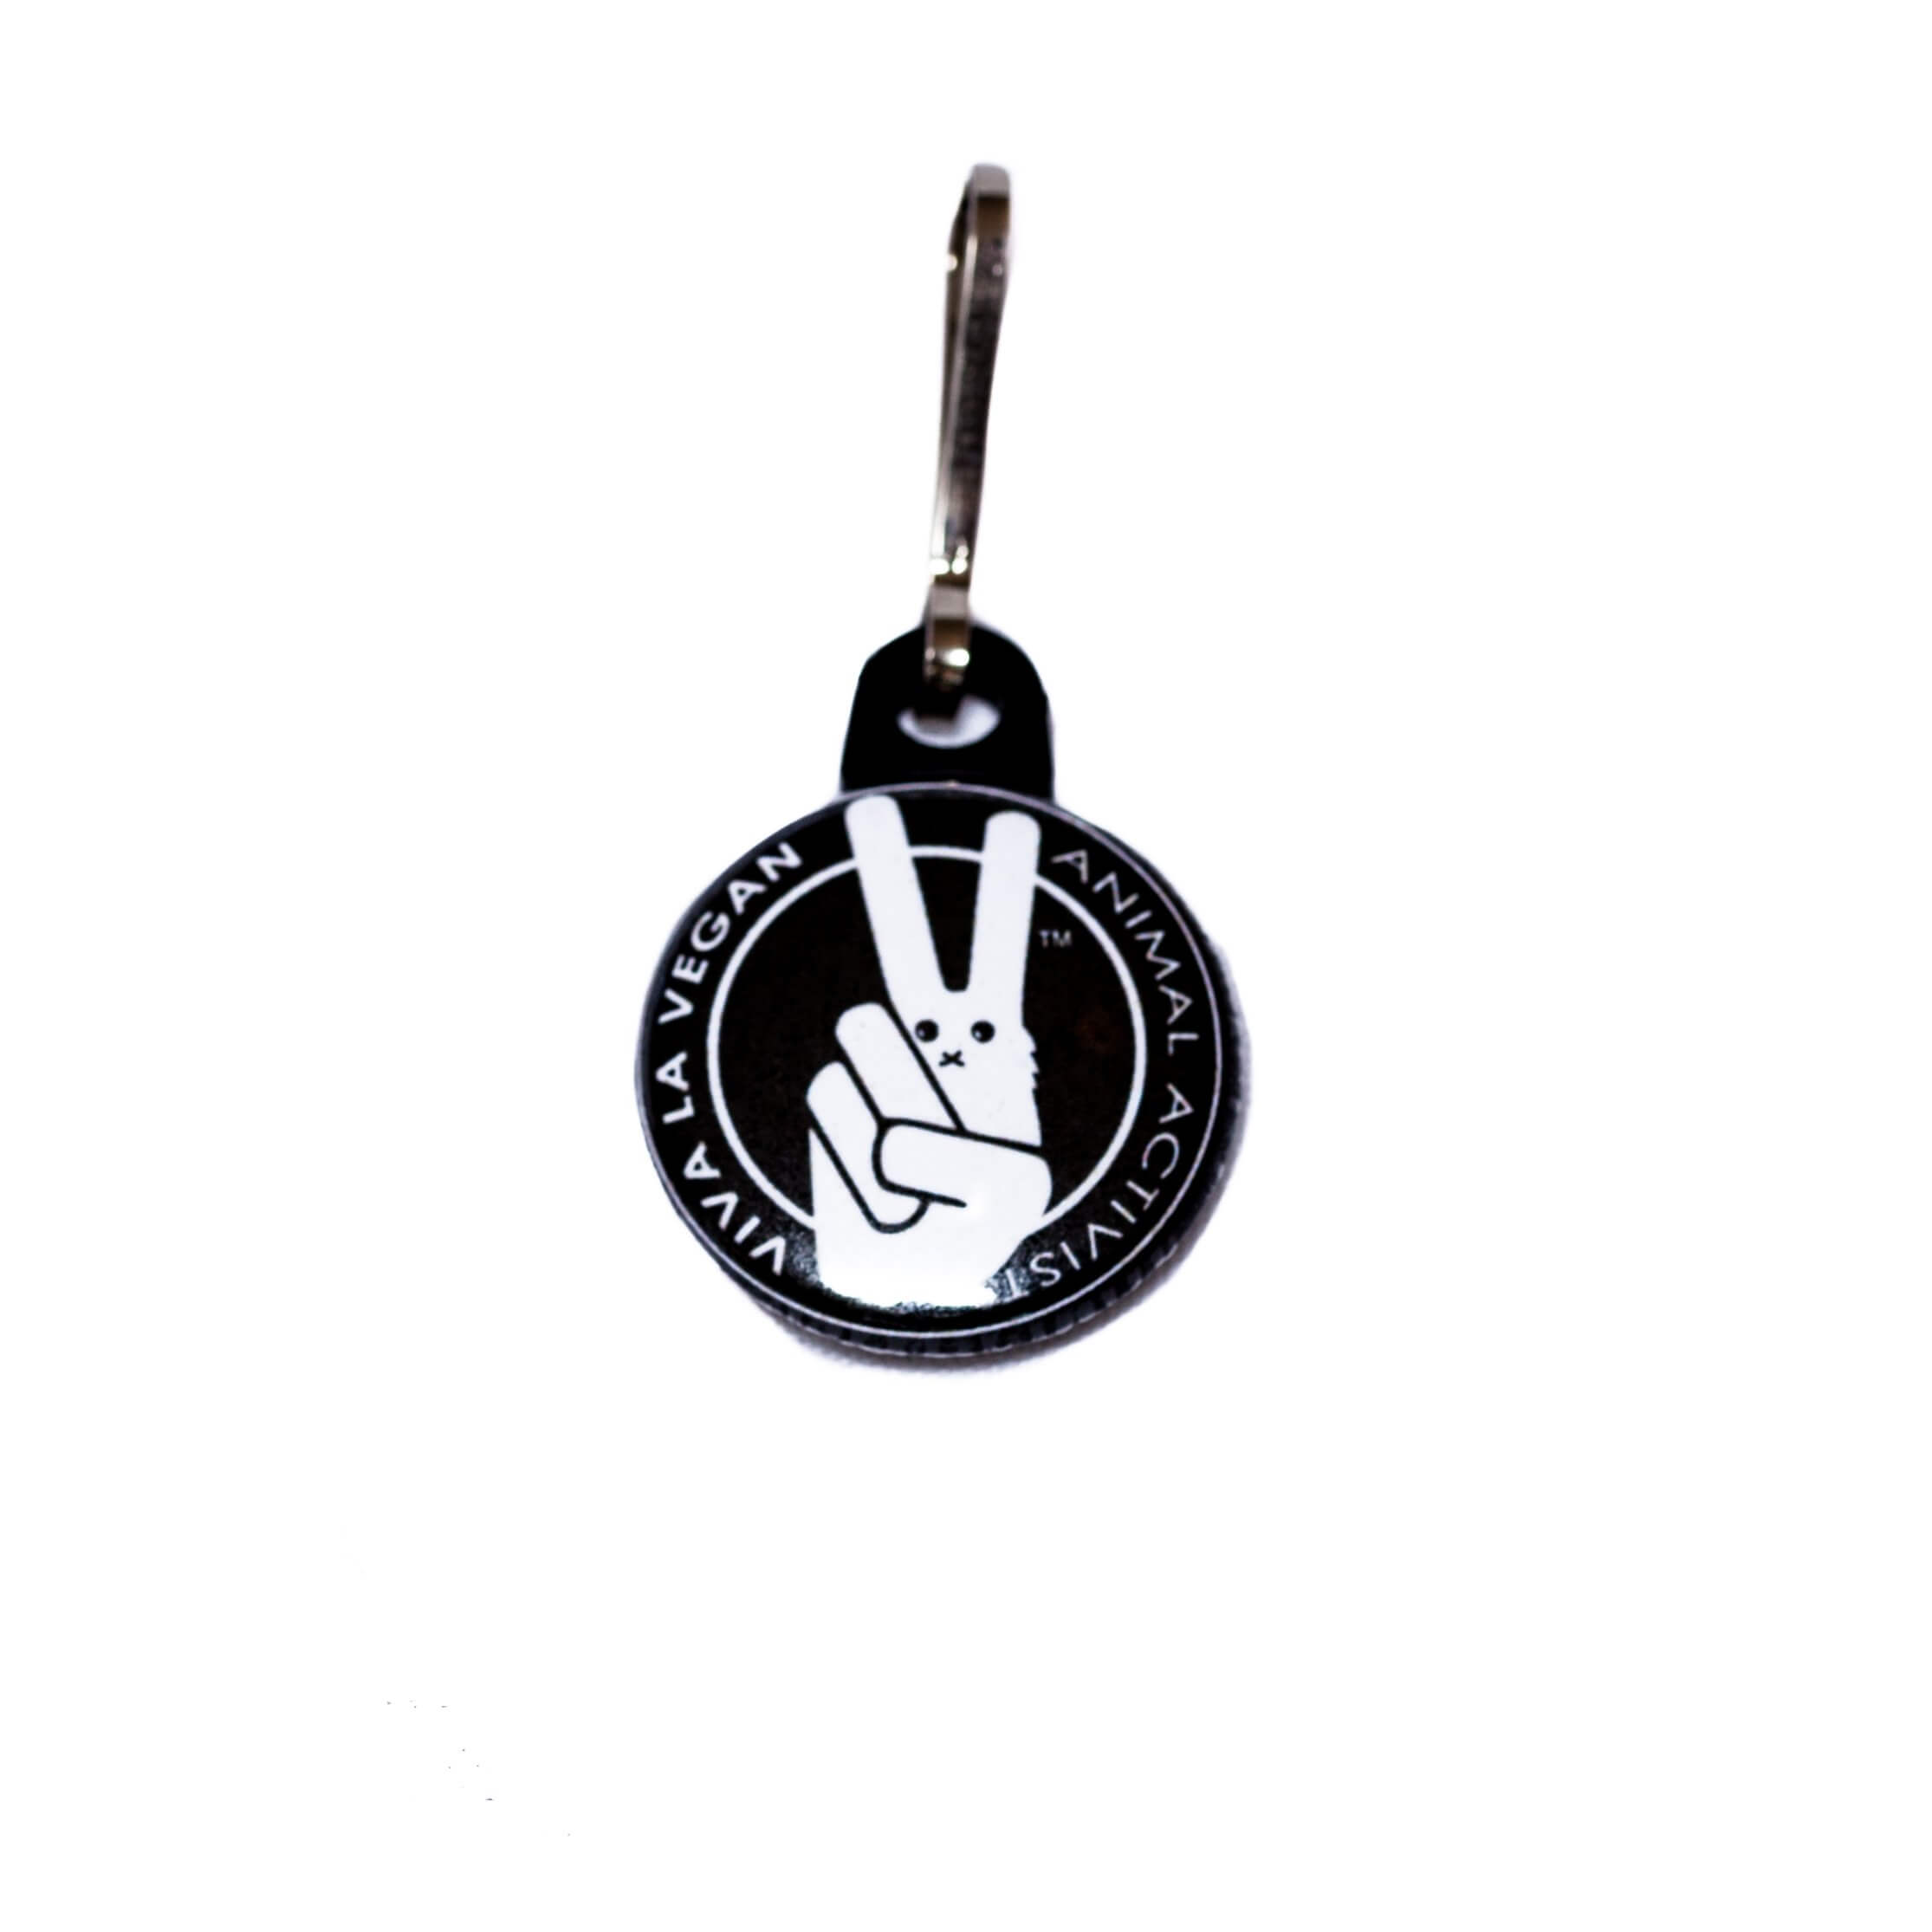 Zip Pull : VLV Signature Bunny